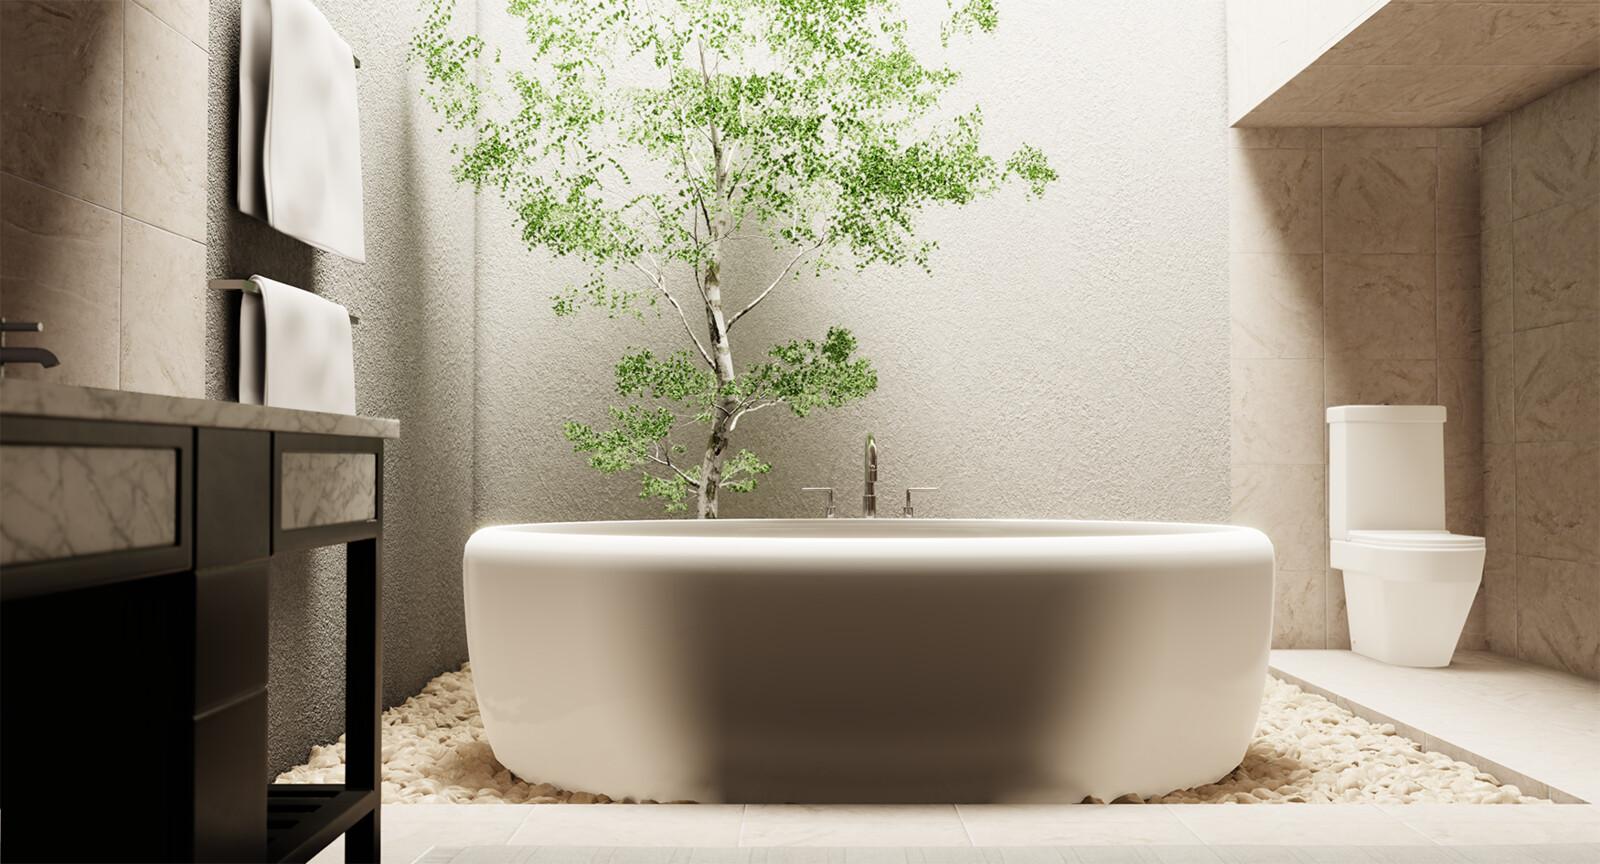 Eevee Realtime Bathroom